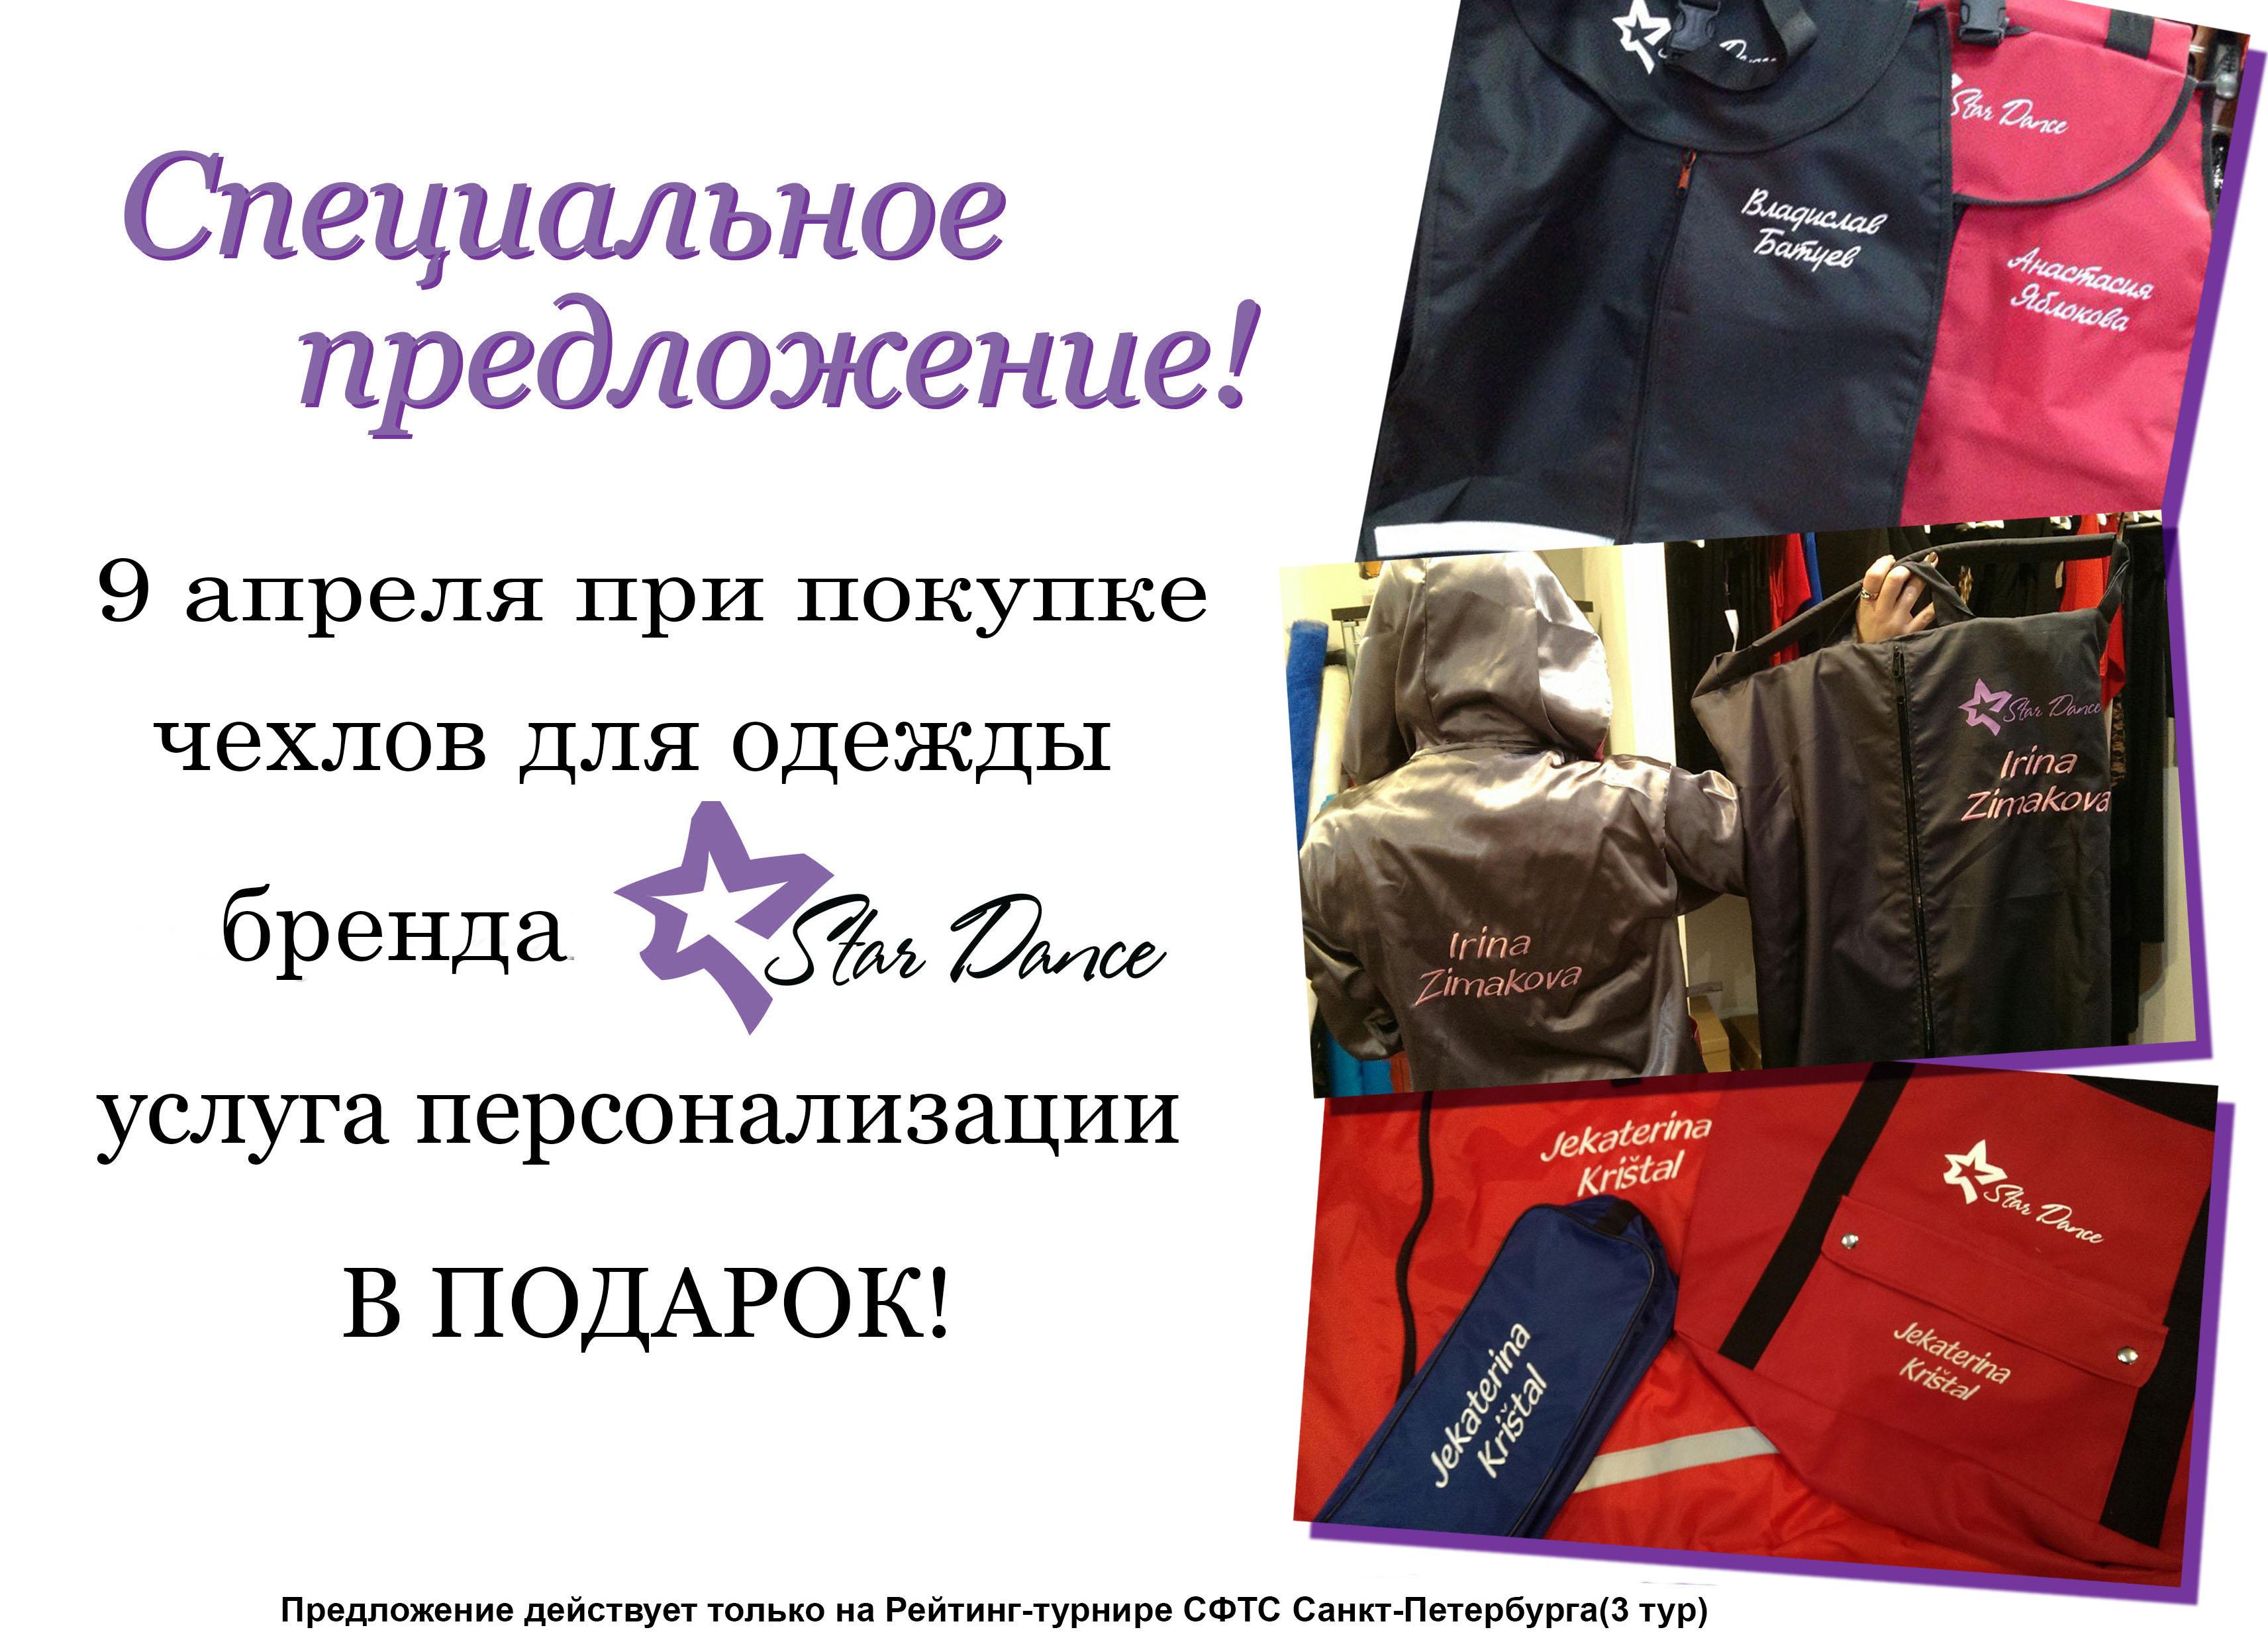 3-й ТУР РЕЙТИНГ-ТУРНИРА СФТС САНКТ-ПЕТЕРБУРГА